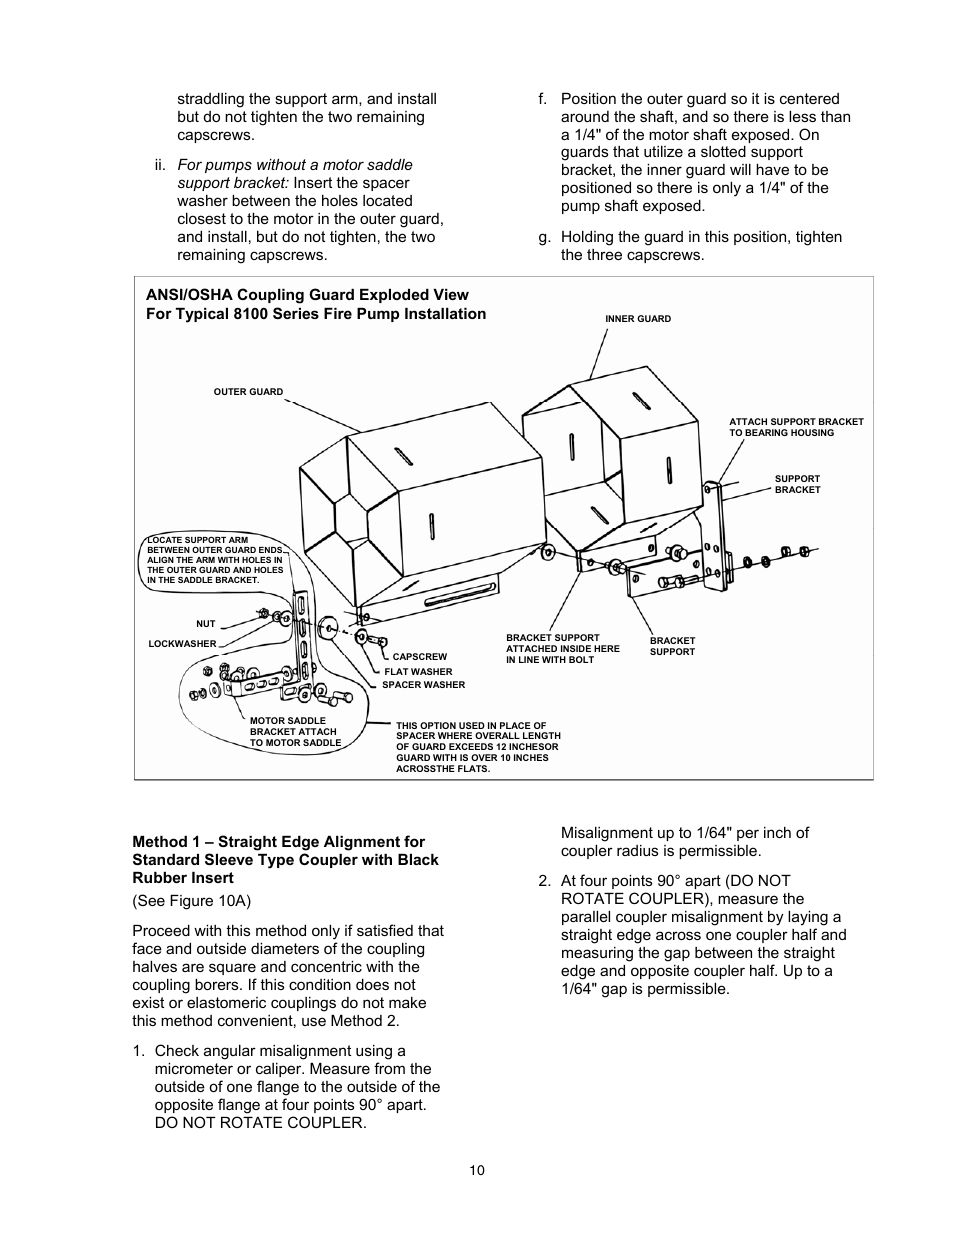 Xylem 8100 Series Centrifugal Pumps AC2515 REV C User Manual